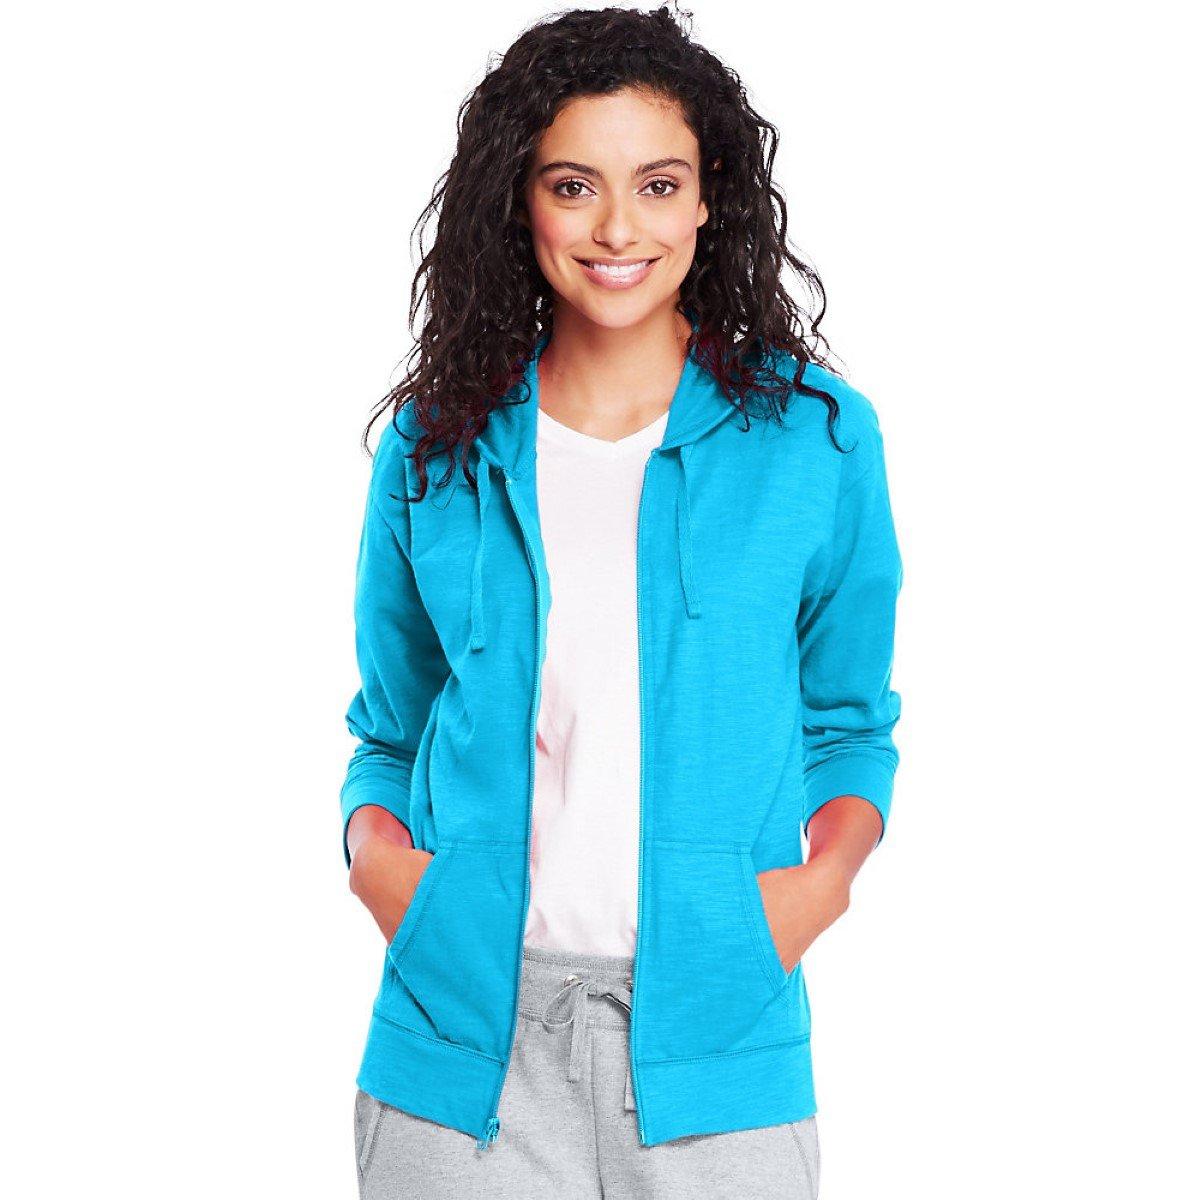 Hanes by Womens Slub Jersey Hoodie O9249_Process Blue_XL